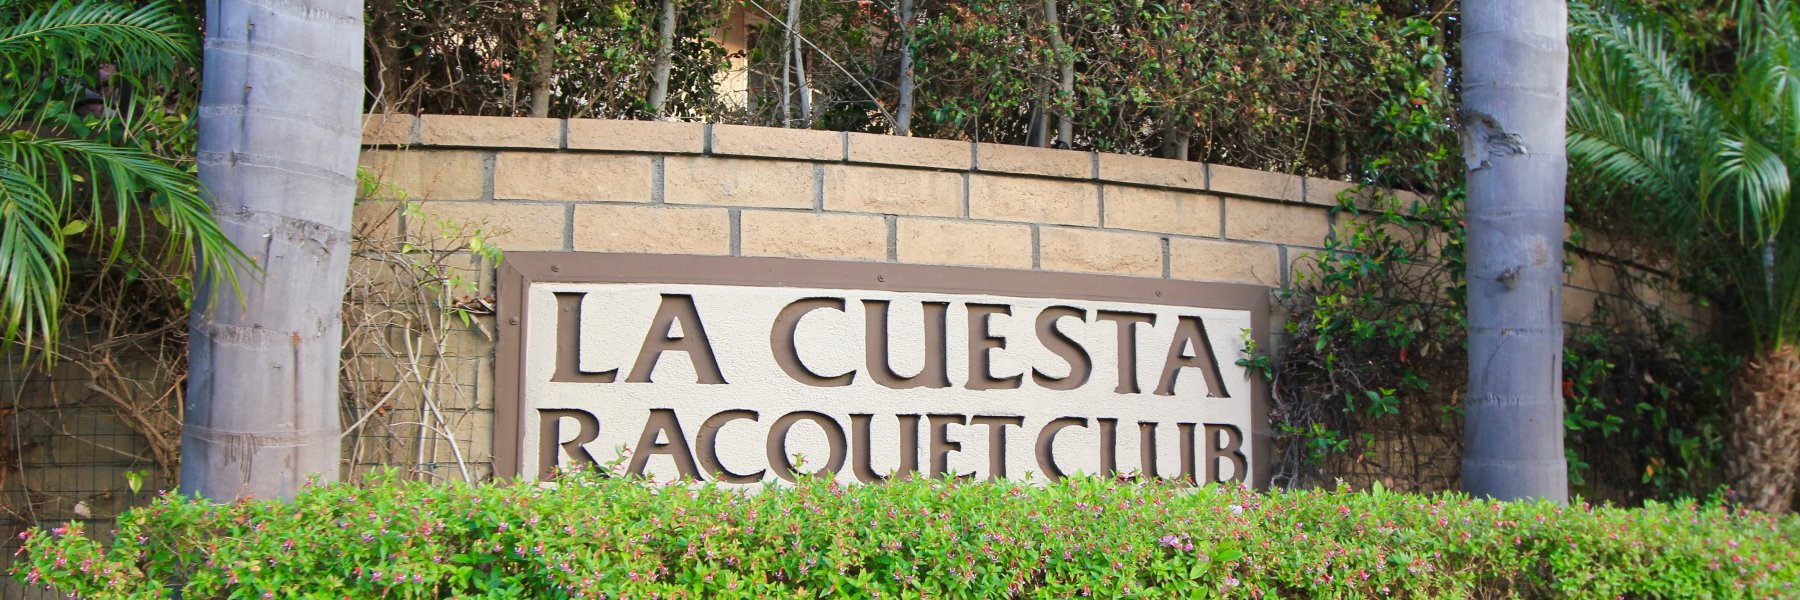 La Cuesta Racquet Club is a community of homes in Huntington Beach California